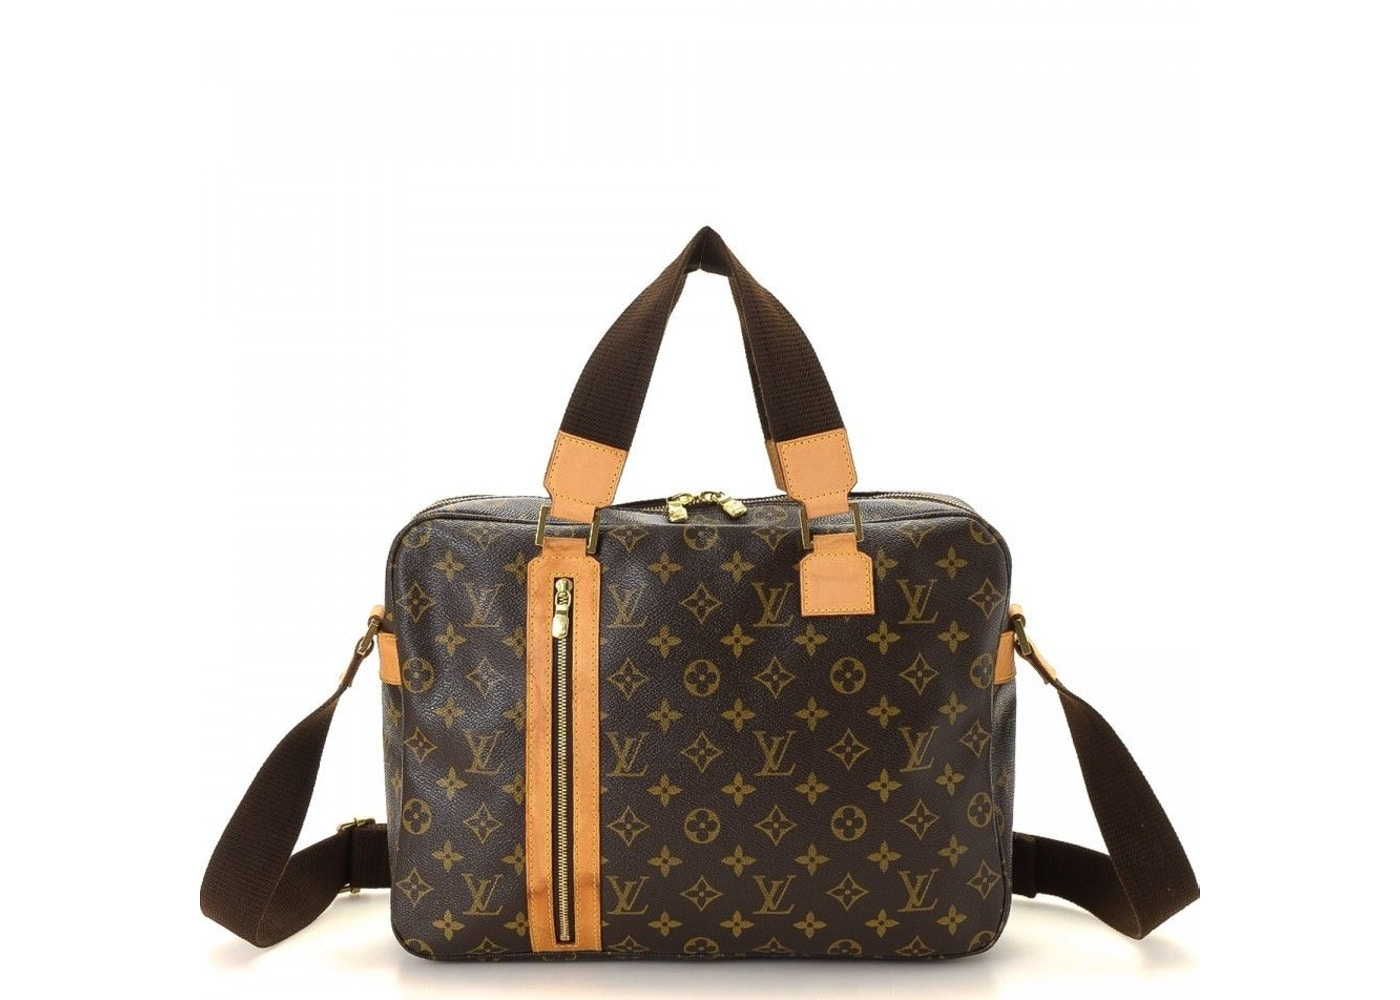 8e6a449614335 Louis Vuitton Messenger Sac Bosphore Monogram Brown. Monogram Brown